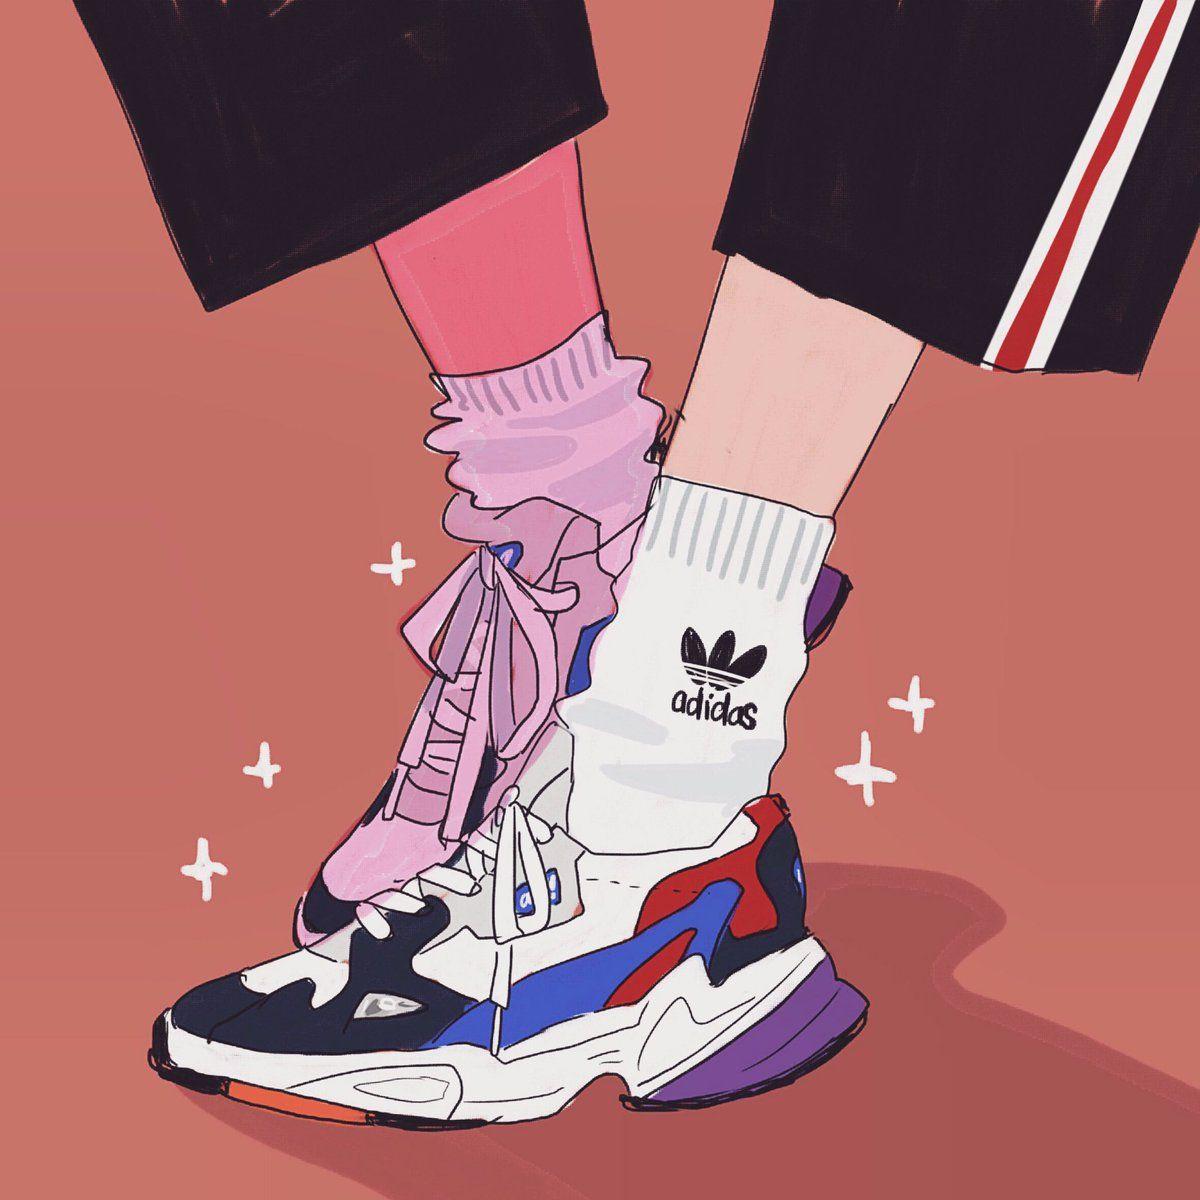 Amelia Lola罗 On Twitter Girl Sketch Retro Painting Sneaker Art